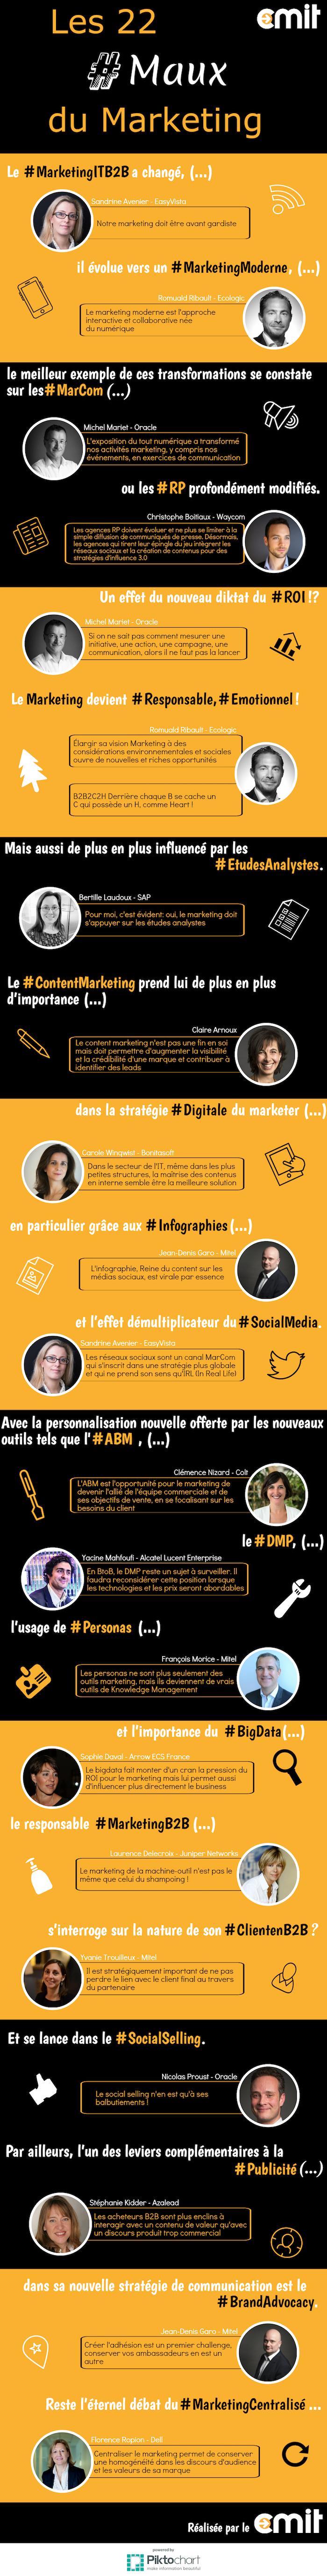 Infographie CMIT[3]